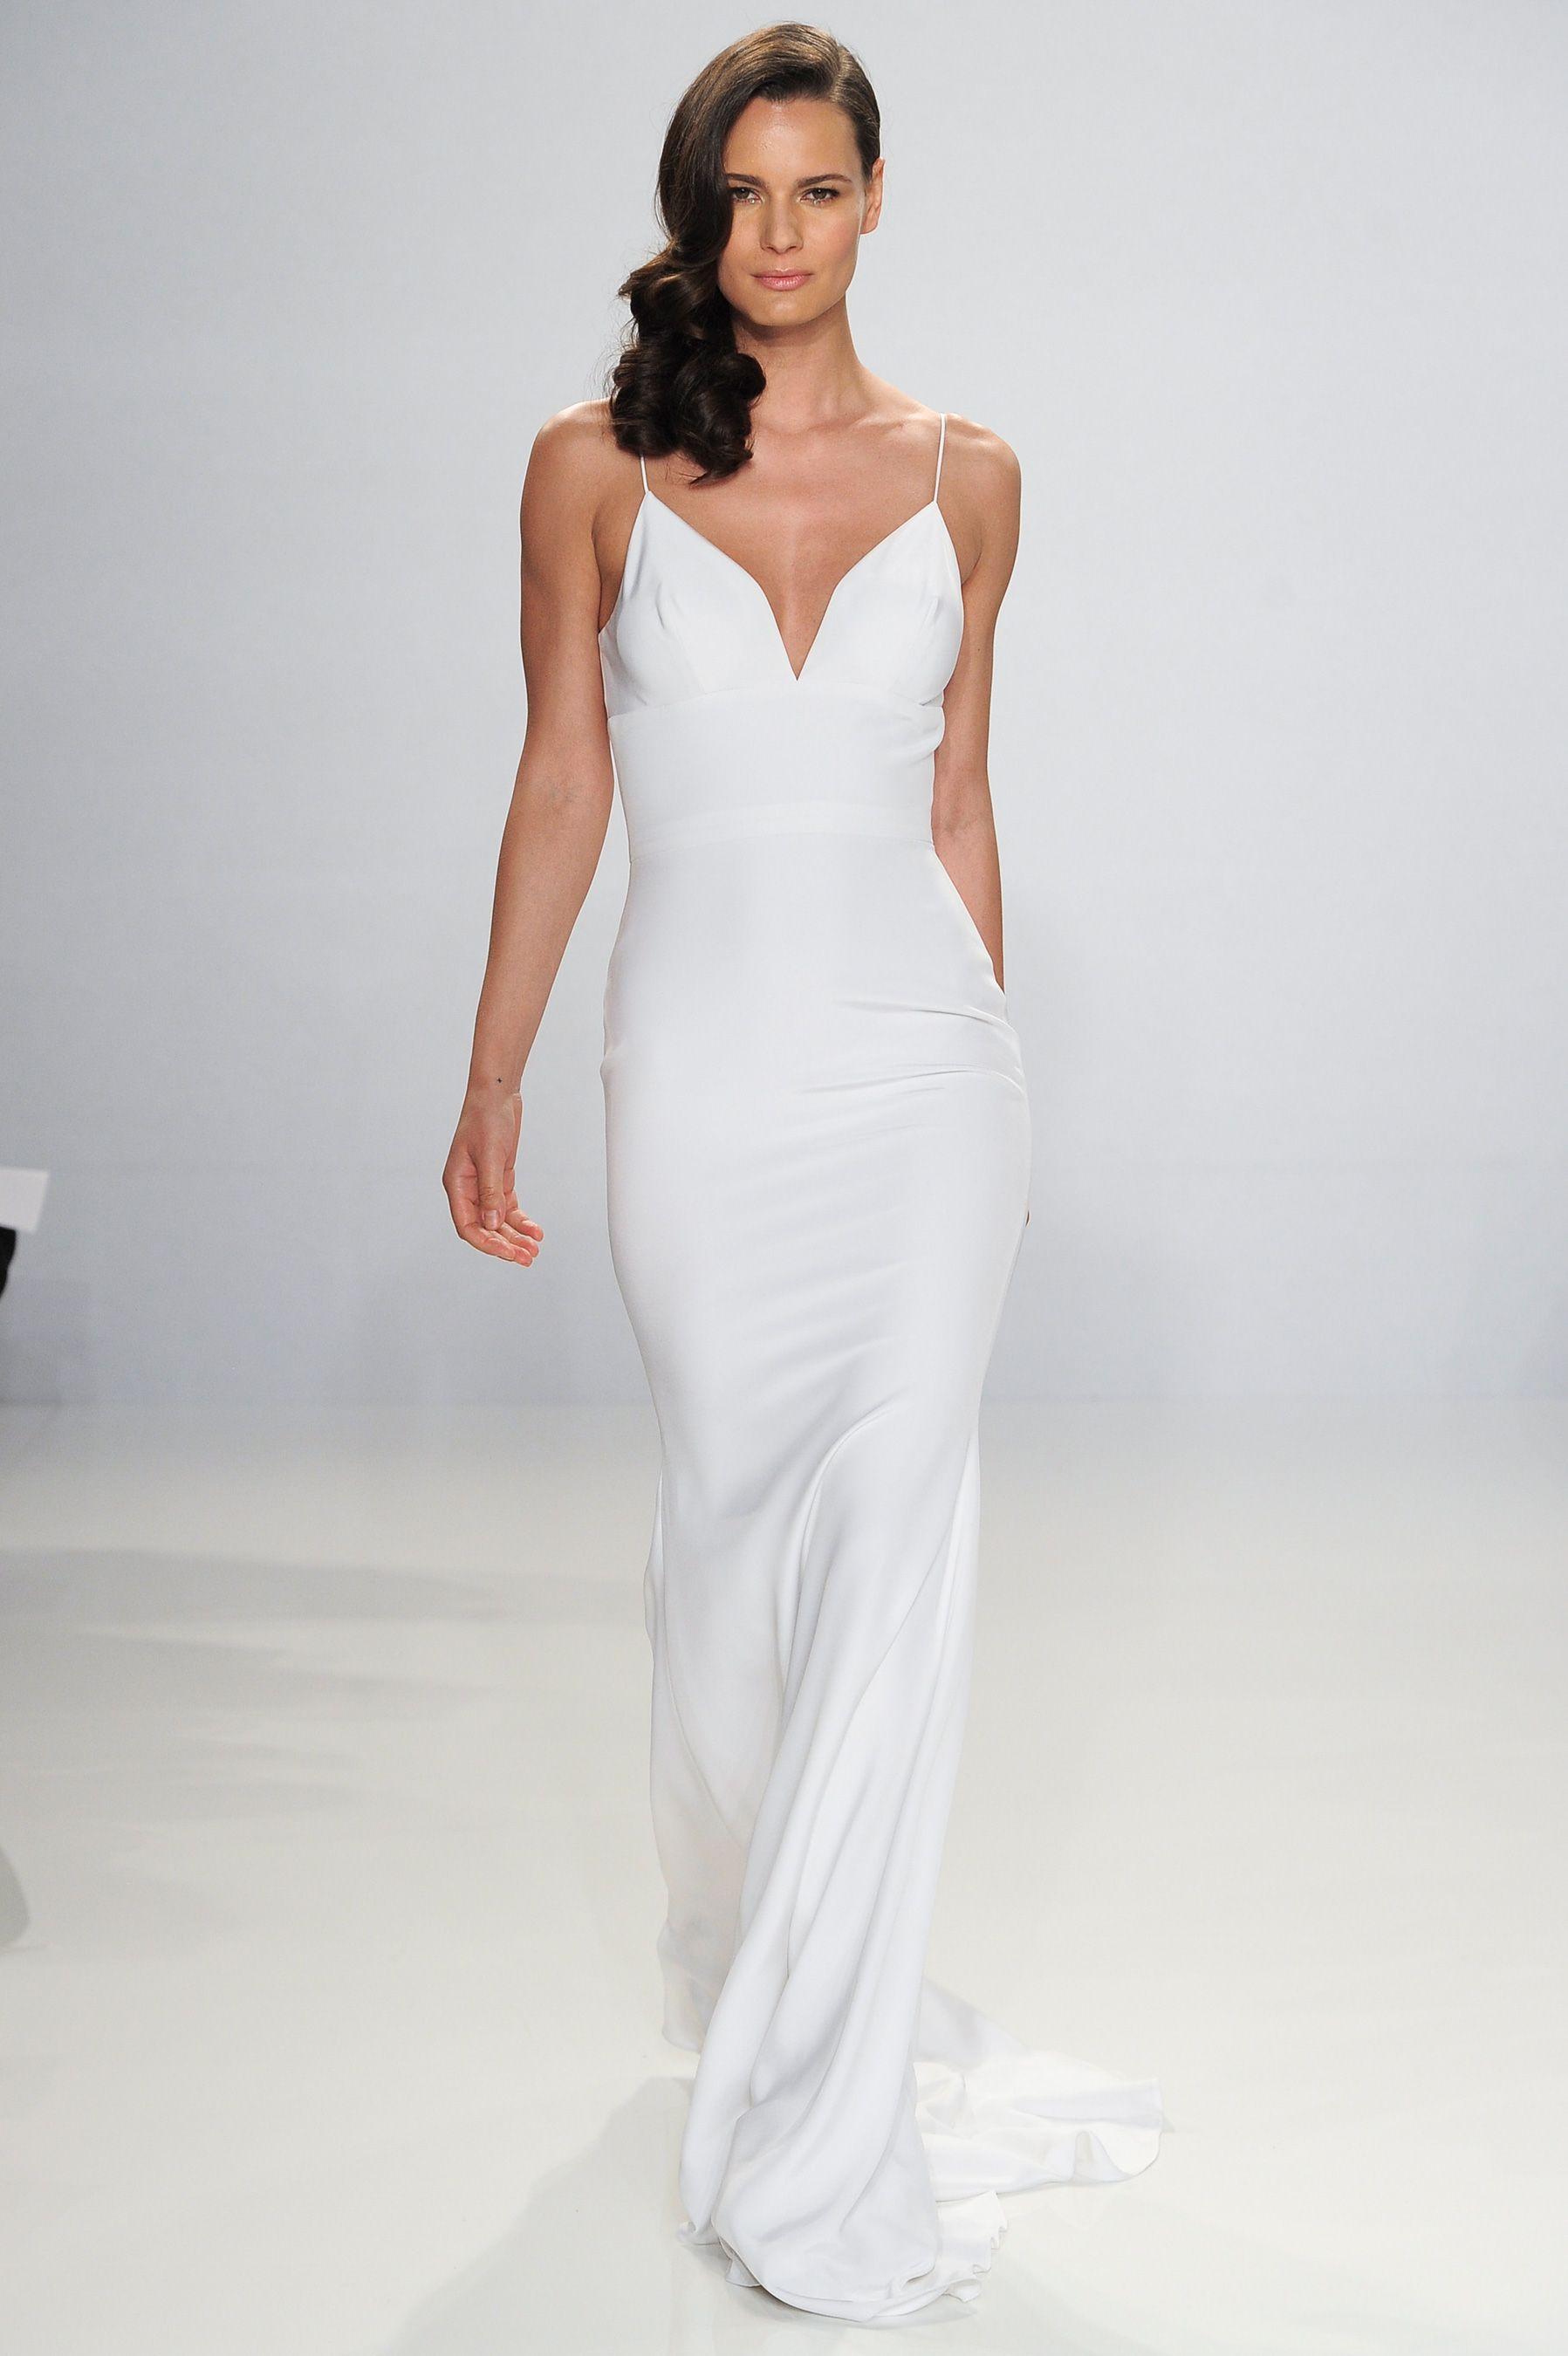 10 Beach Wedding Dresses You Can Buy Off The Rack Slip Wedding Dress Wedding Dresses Kleinfeld Christian Siriano Wedding Dresses